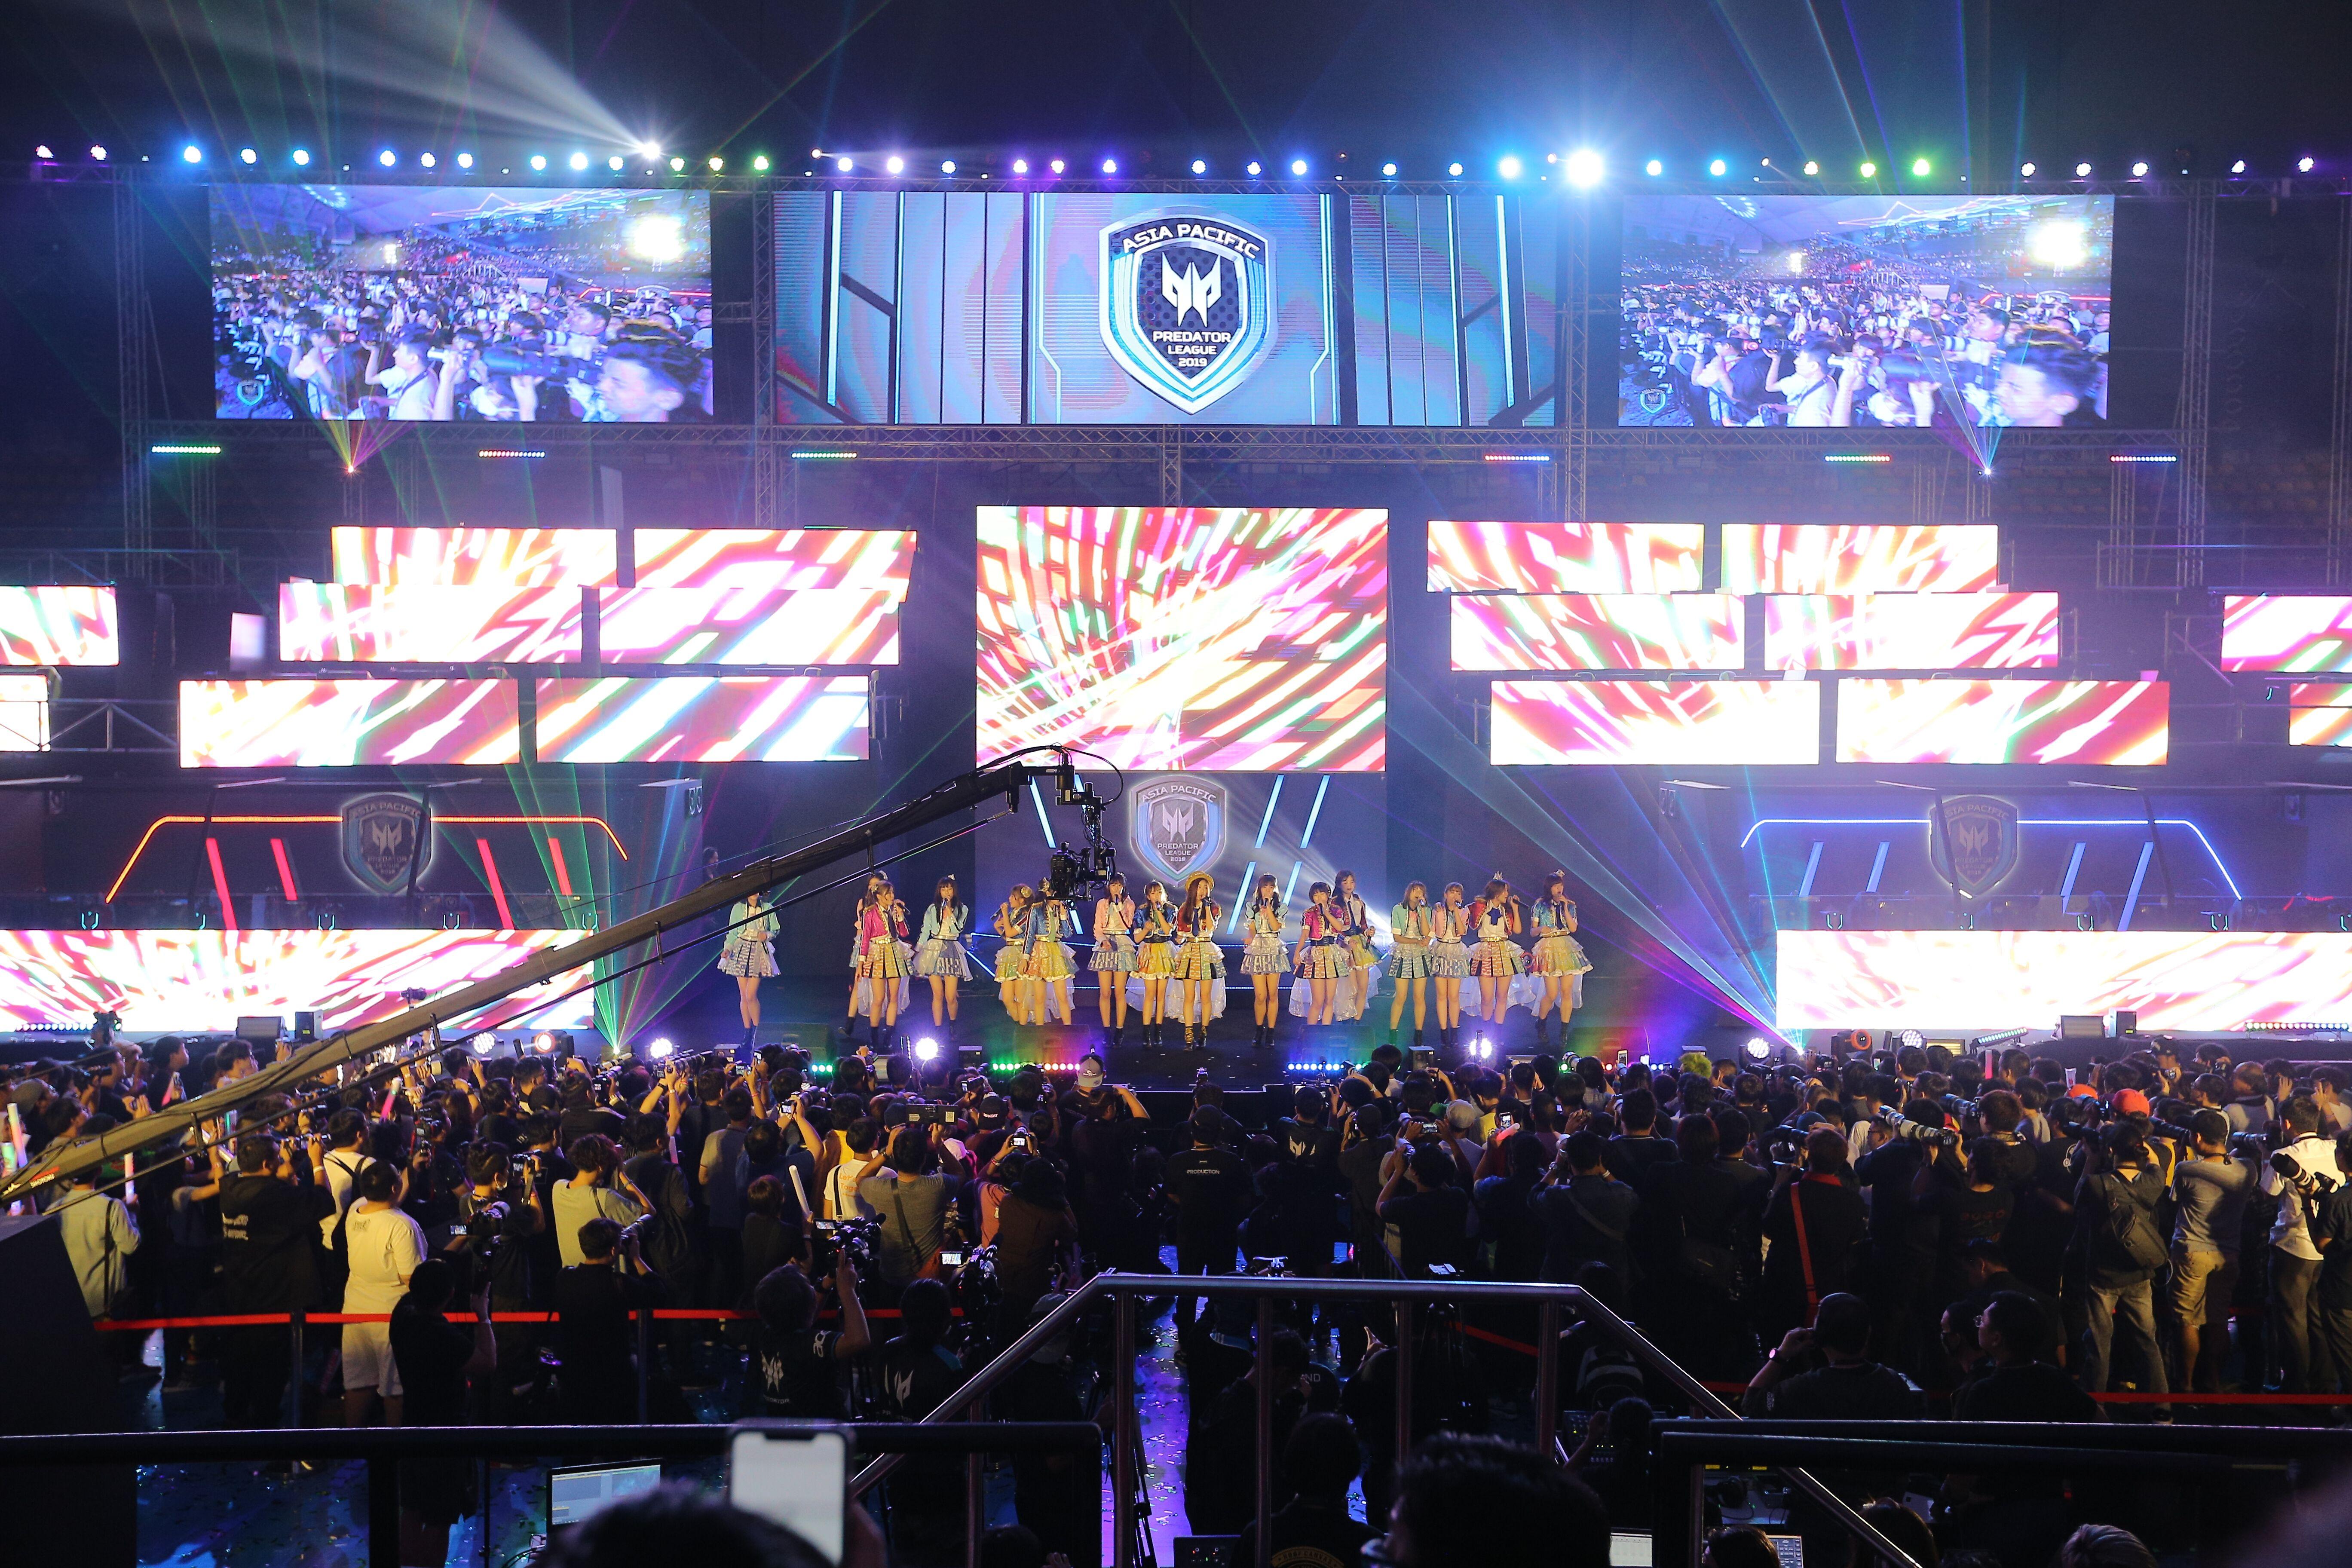 c3lowk72 jpeg1 บรรยากาศงาน Asia Pacific Predator League 2019 สุดยอดขุนพลทีมอีสปอร์ตเข้าร่วมการแข่งขันรอบแกรนด์ไฟนอล